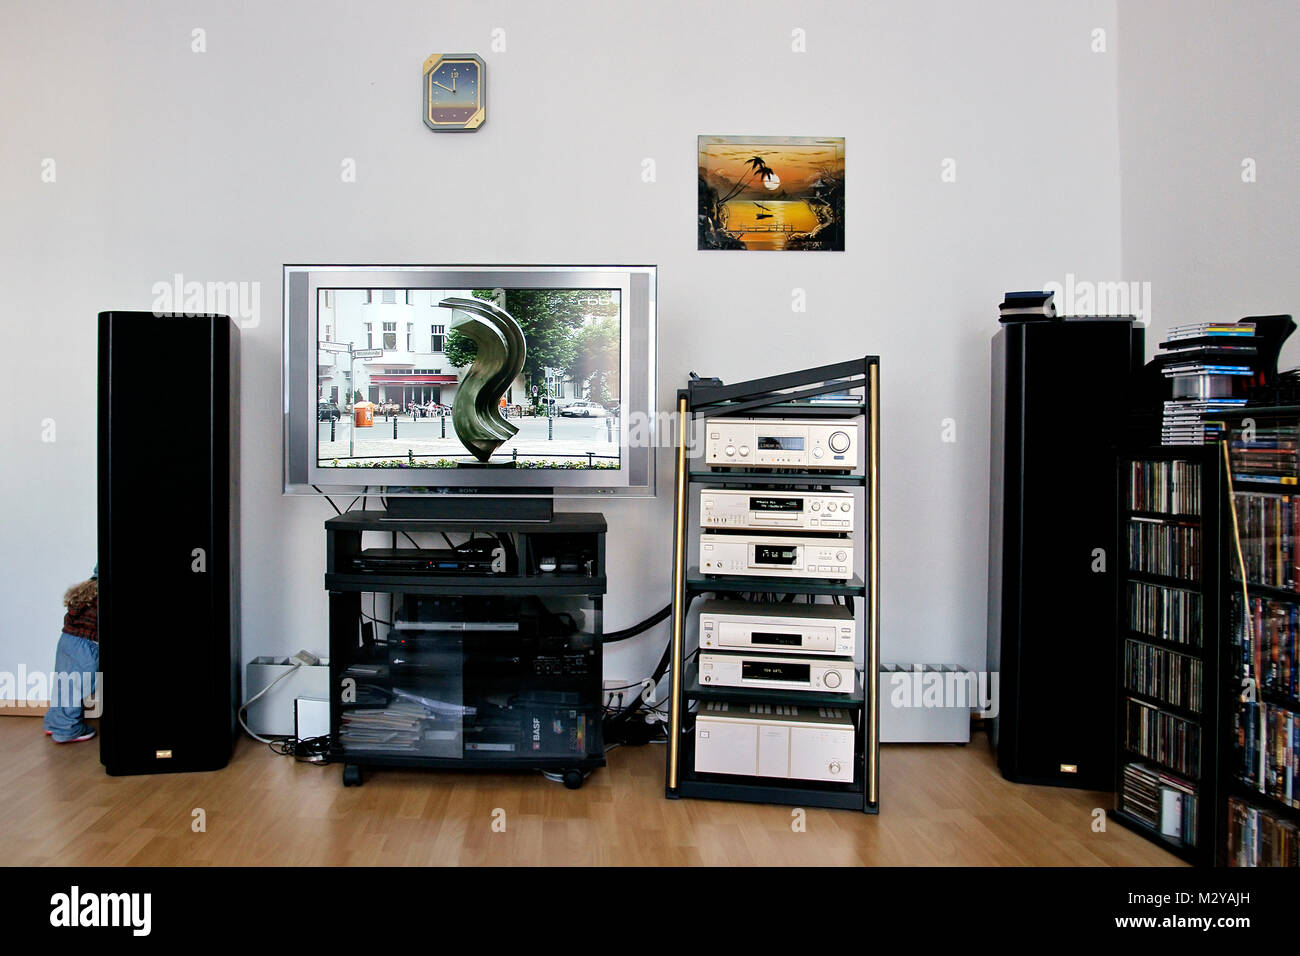 Dvd Schrank Stock Photos & Dvd Schrank Stock Images - Alamy